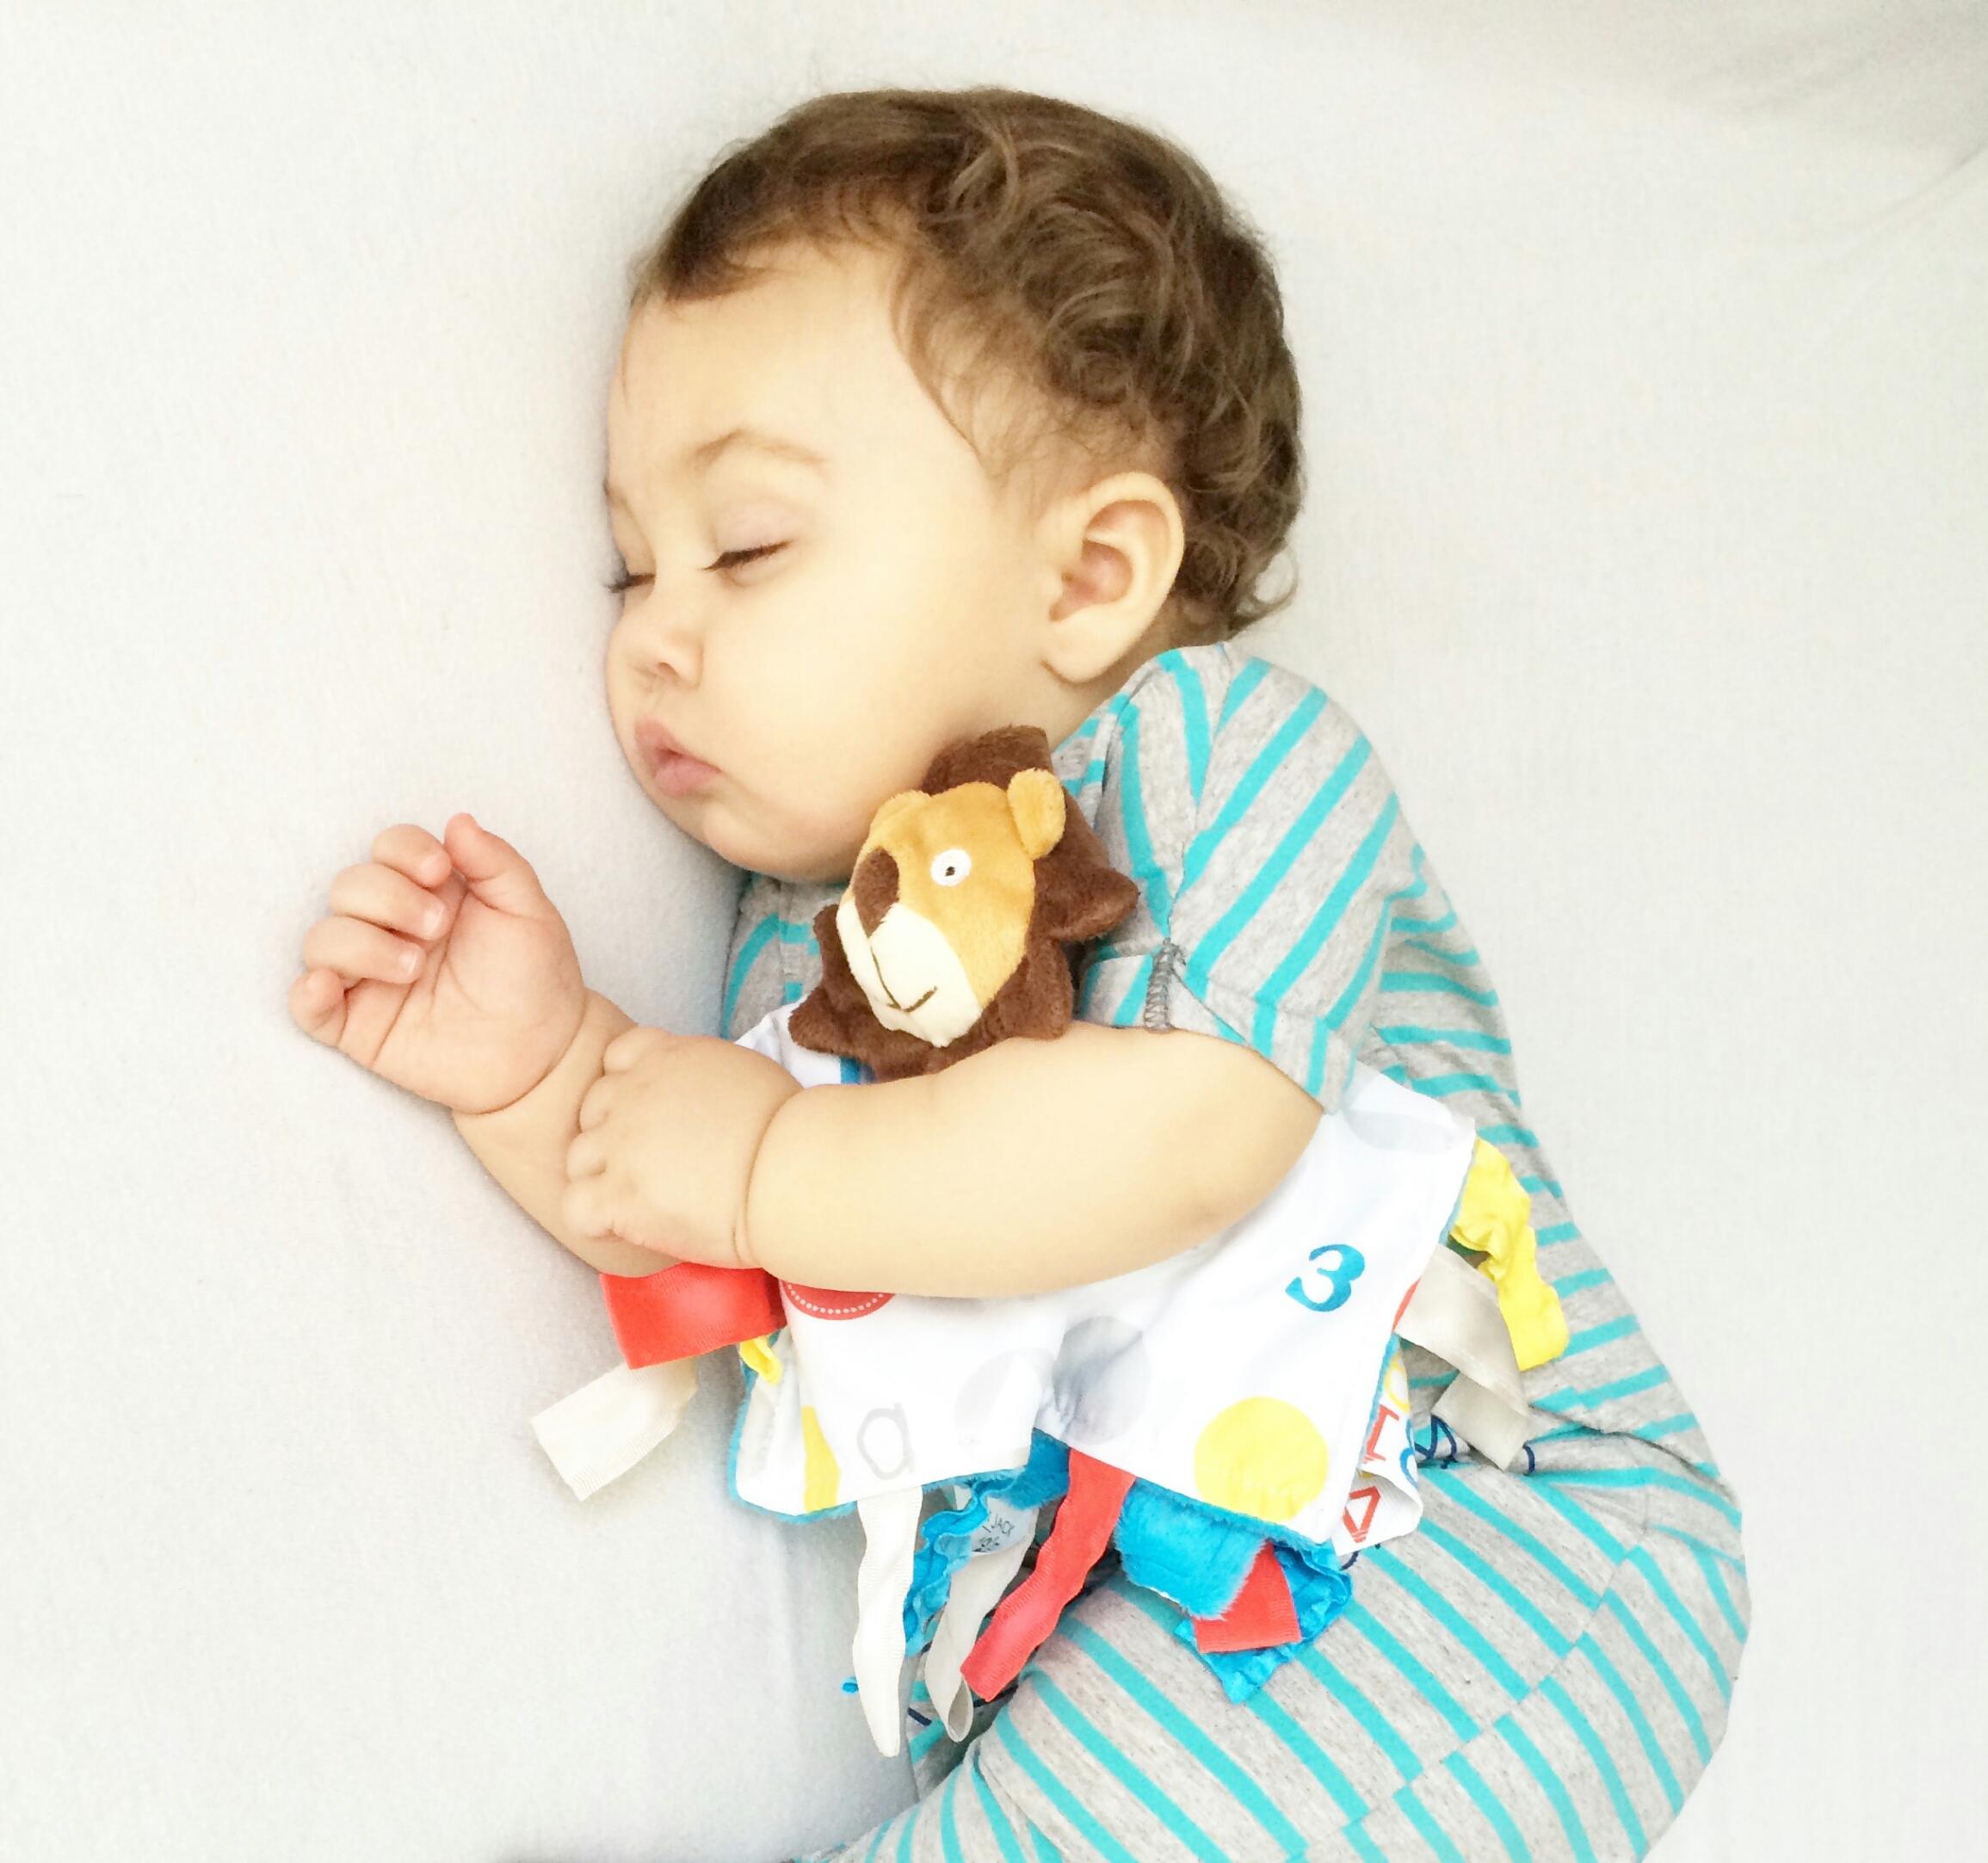 Sensory Tag Blanket from Baby Jack Company